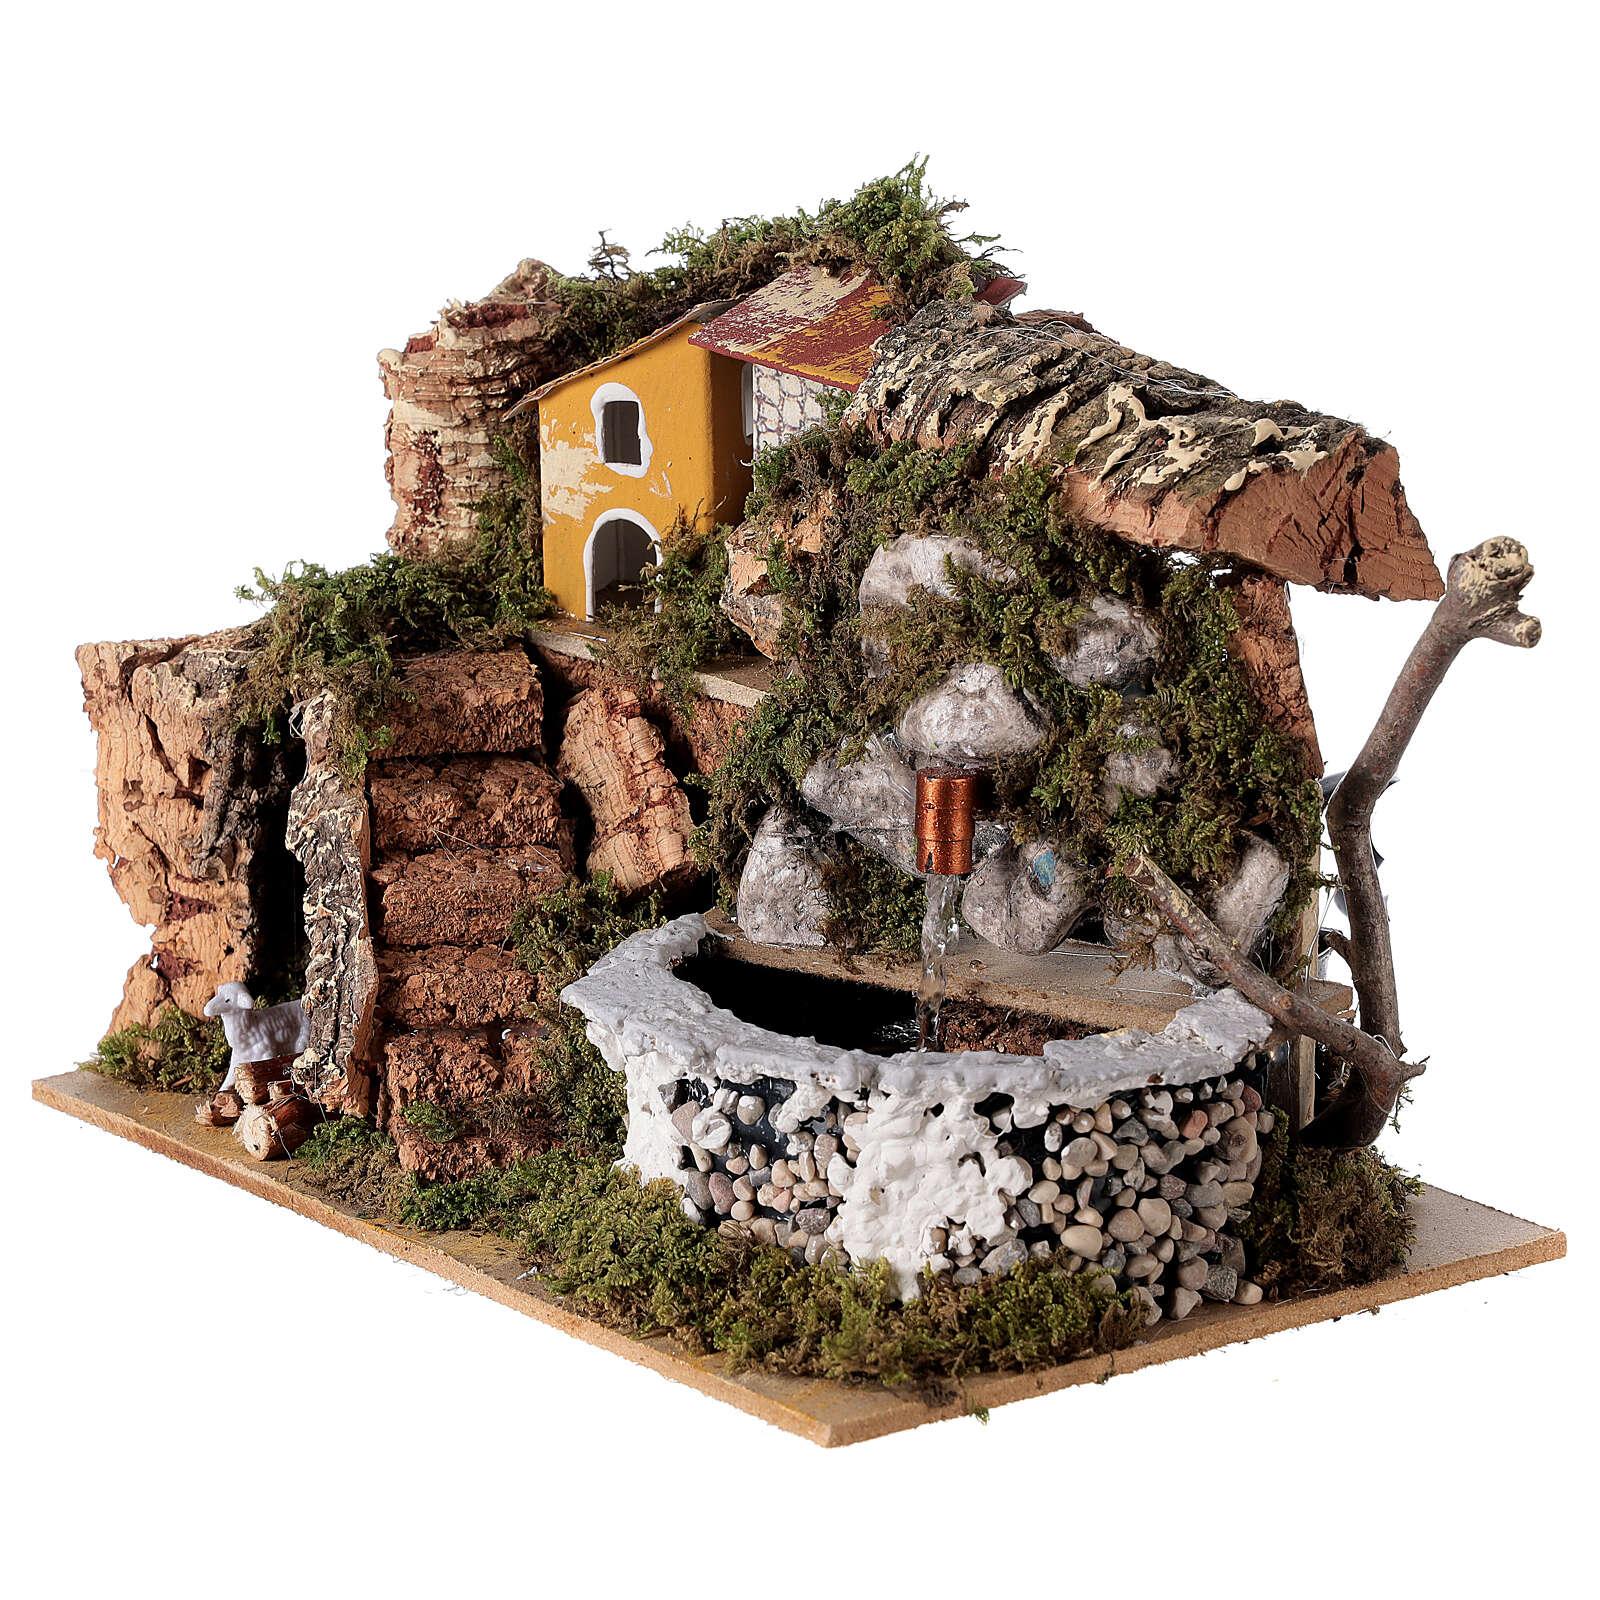 Fontana presepe in pietra 15x20x15 cm per presepi 8-10 cm 4